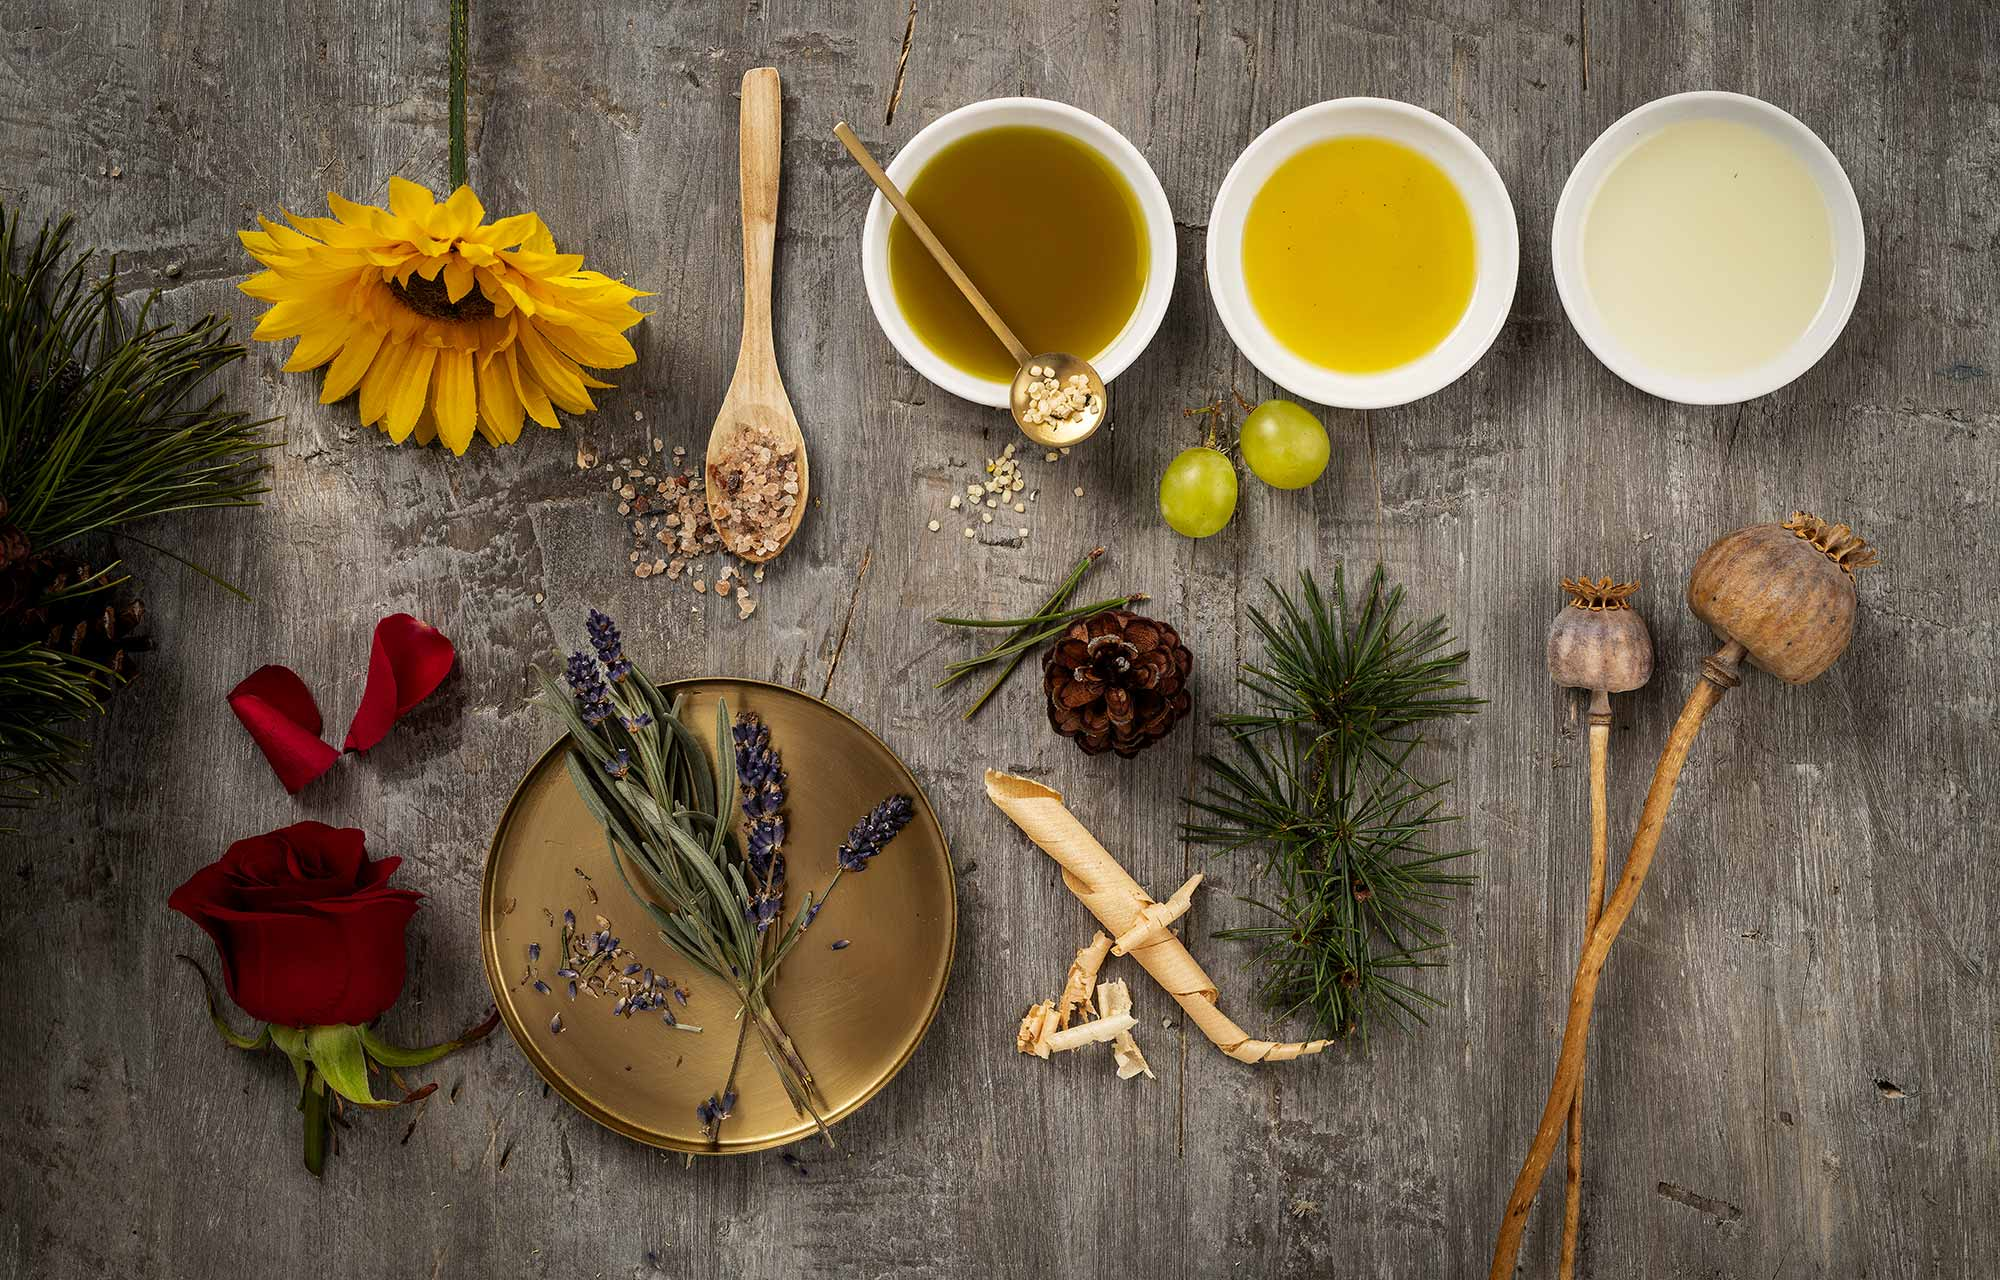 Achtsam Kosmetik - Zirbe, Leindotteröl, Hanföl, Rapsöl, Sonnenblumenöl, Lavendel, Mohn, Latschenkiefer, Rosenblüten